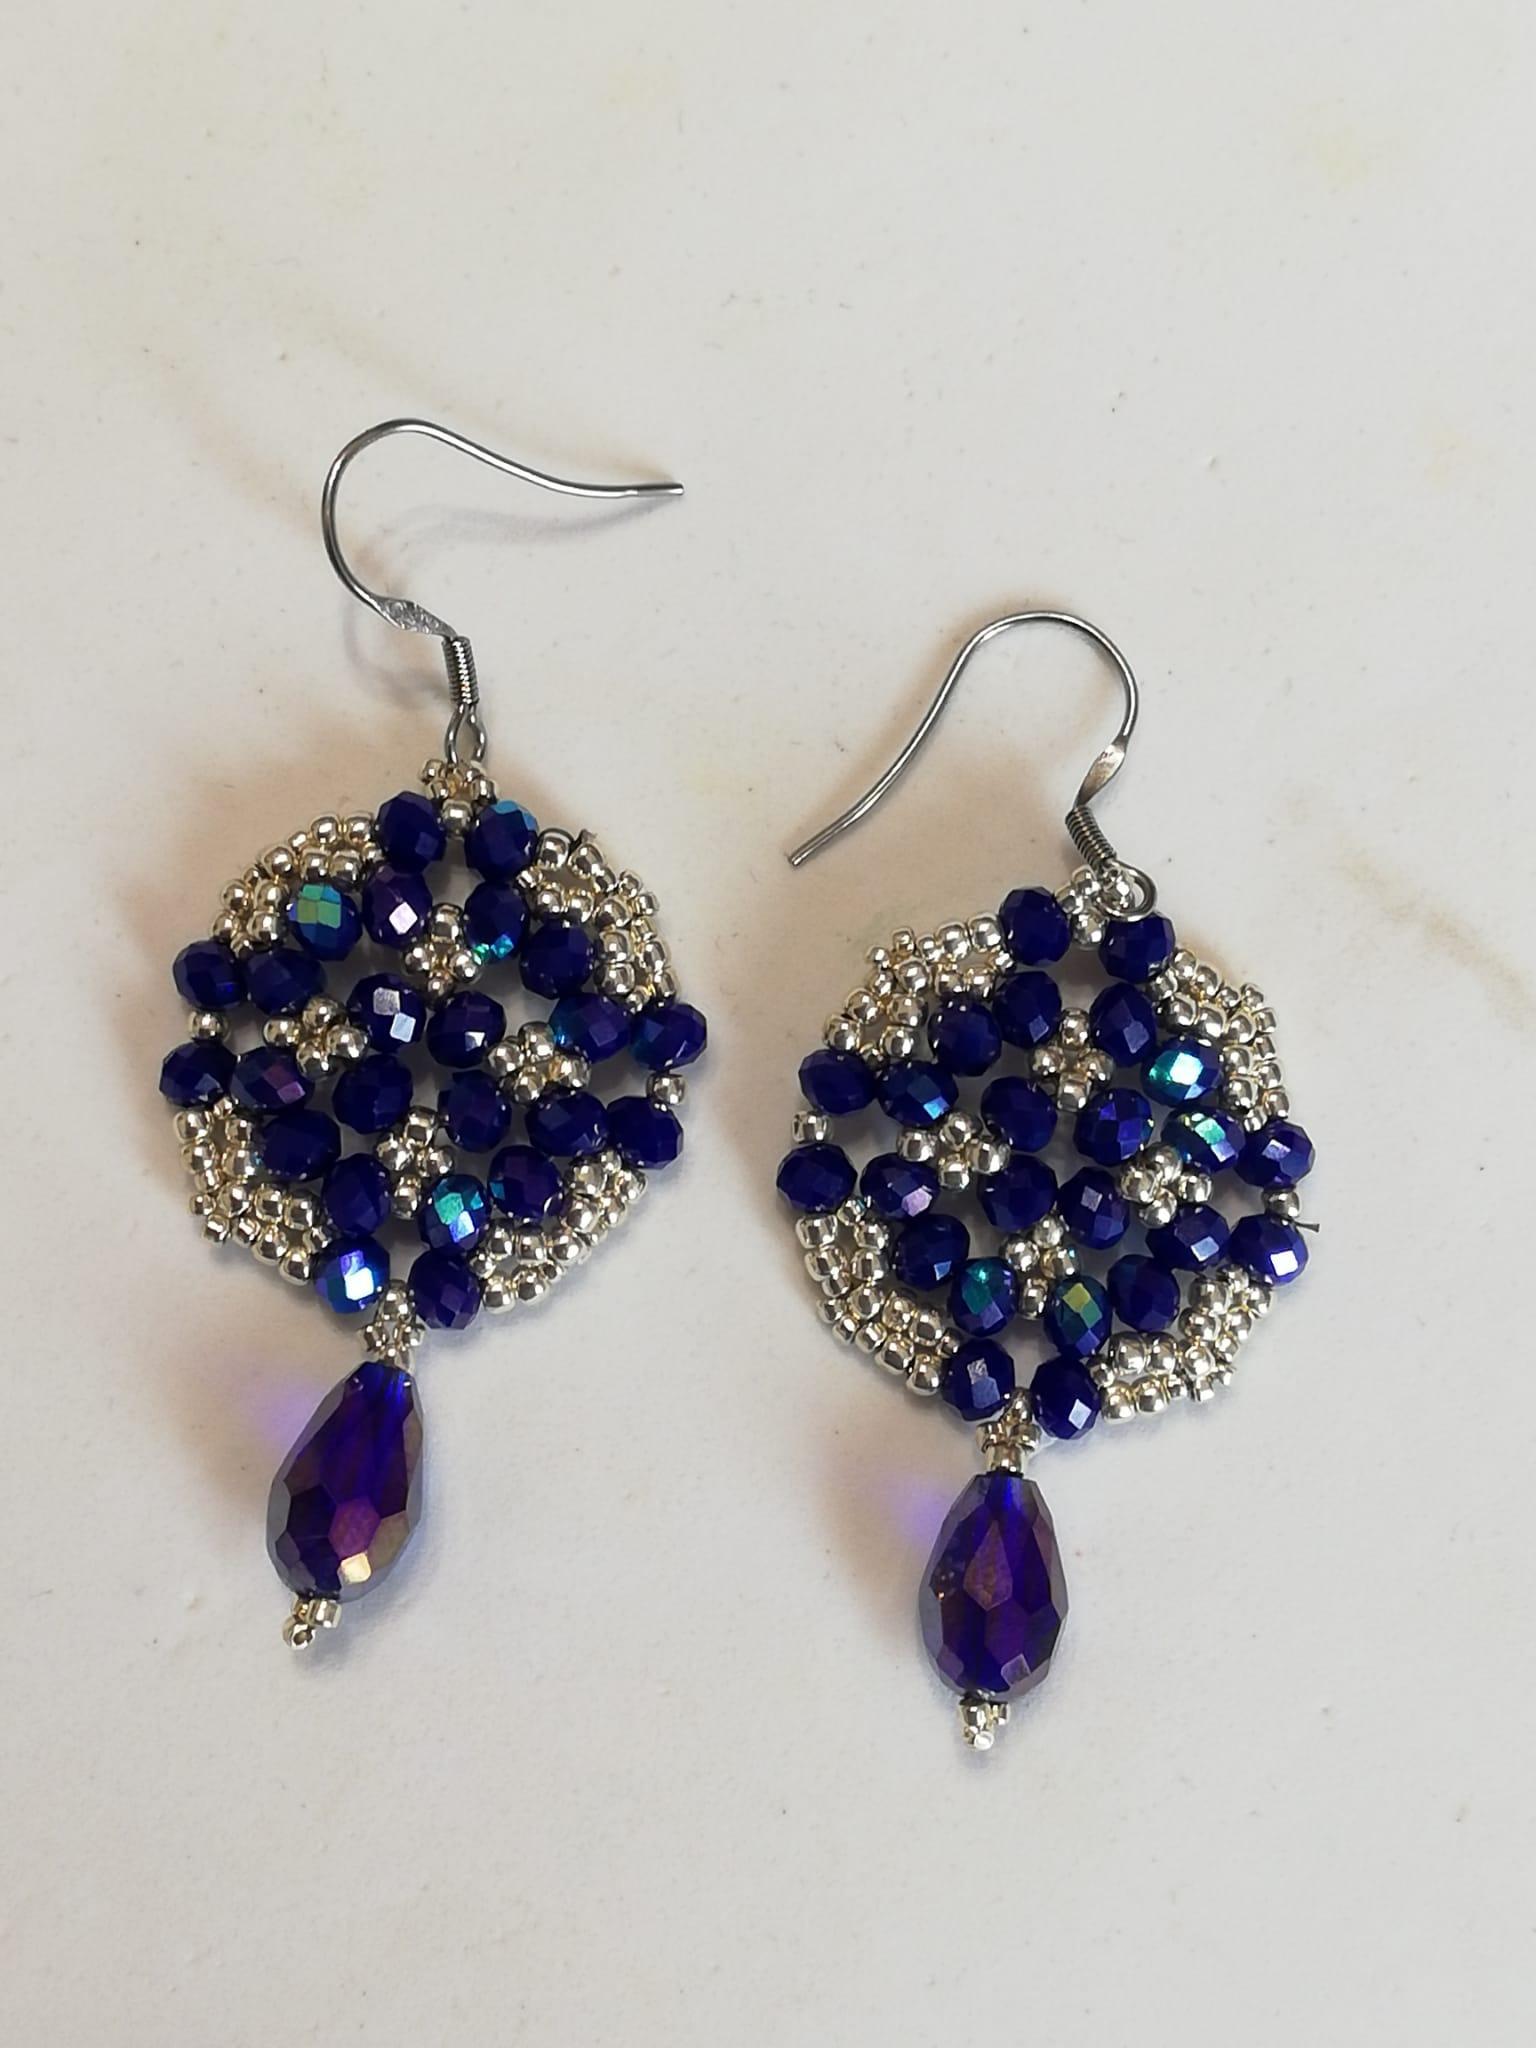 Blue and silver earrings | handmade costume jewellery online sale